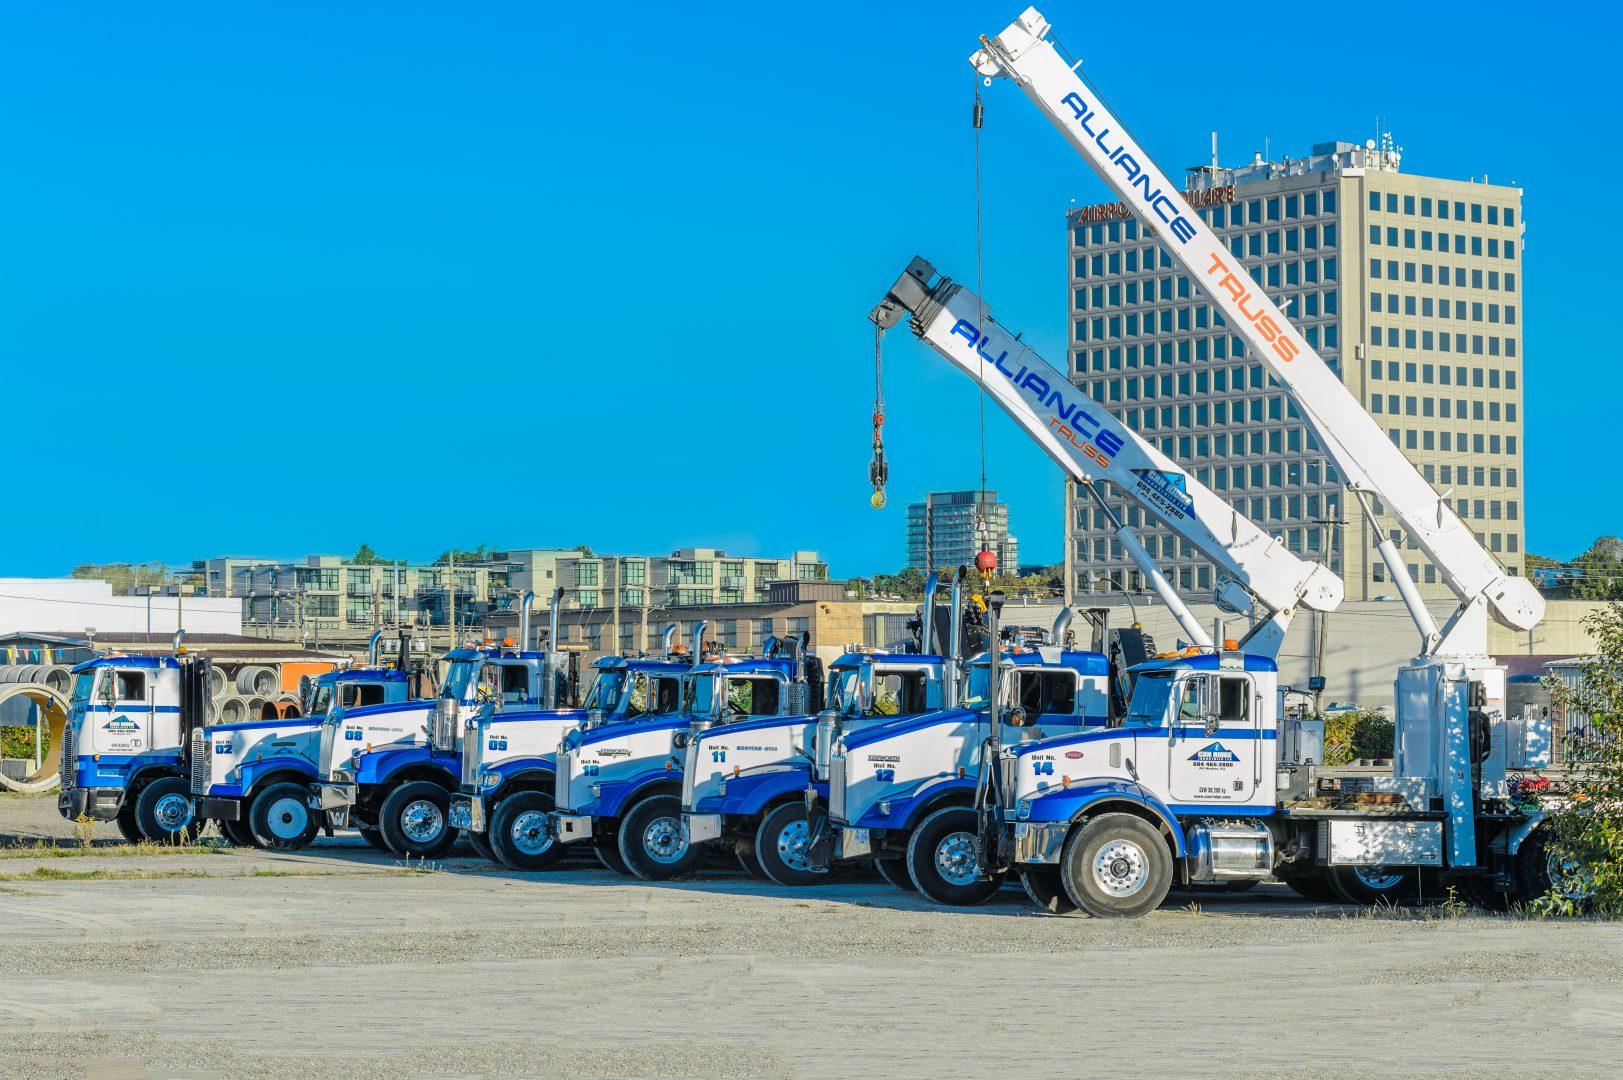 Concrete Retaining Walls, Blocks & Barriers   Train & Transportation Company   Can Ridge Industries Ltd.